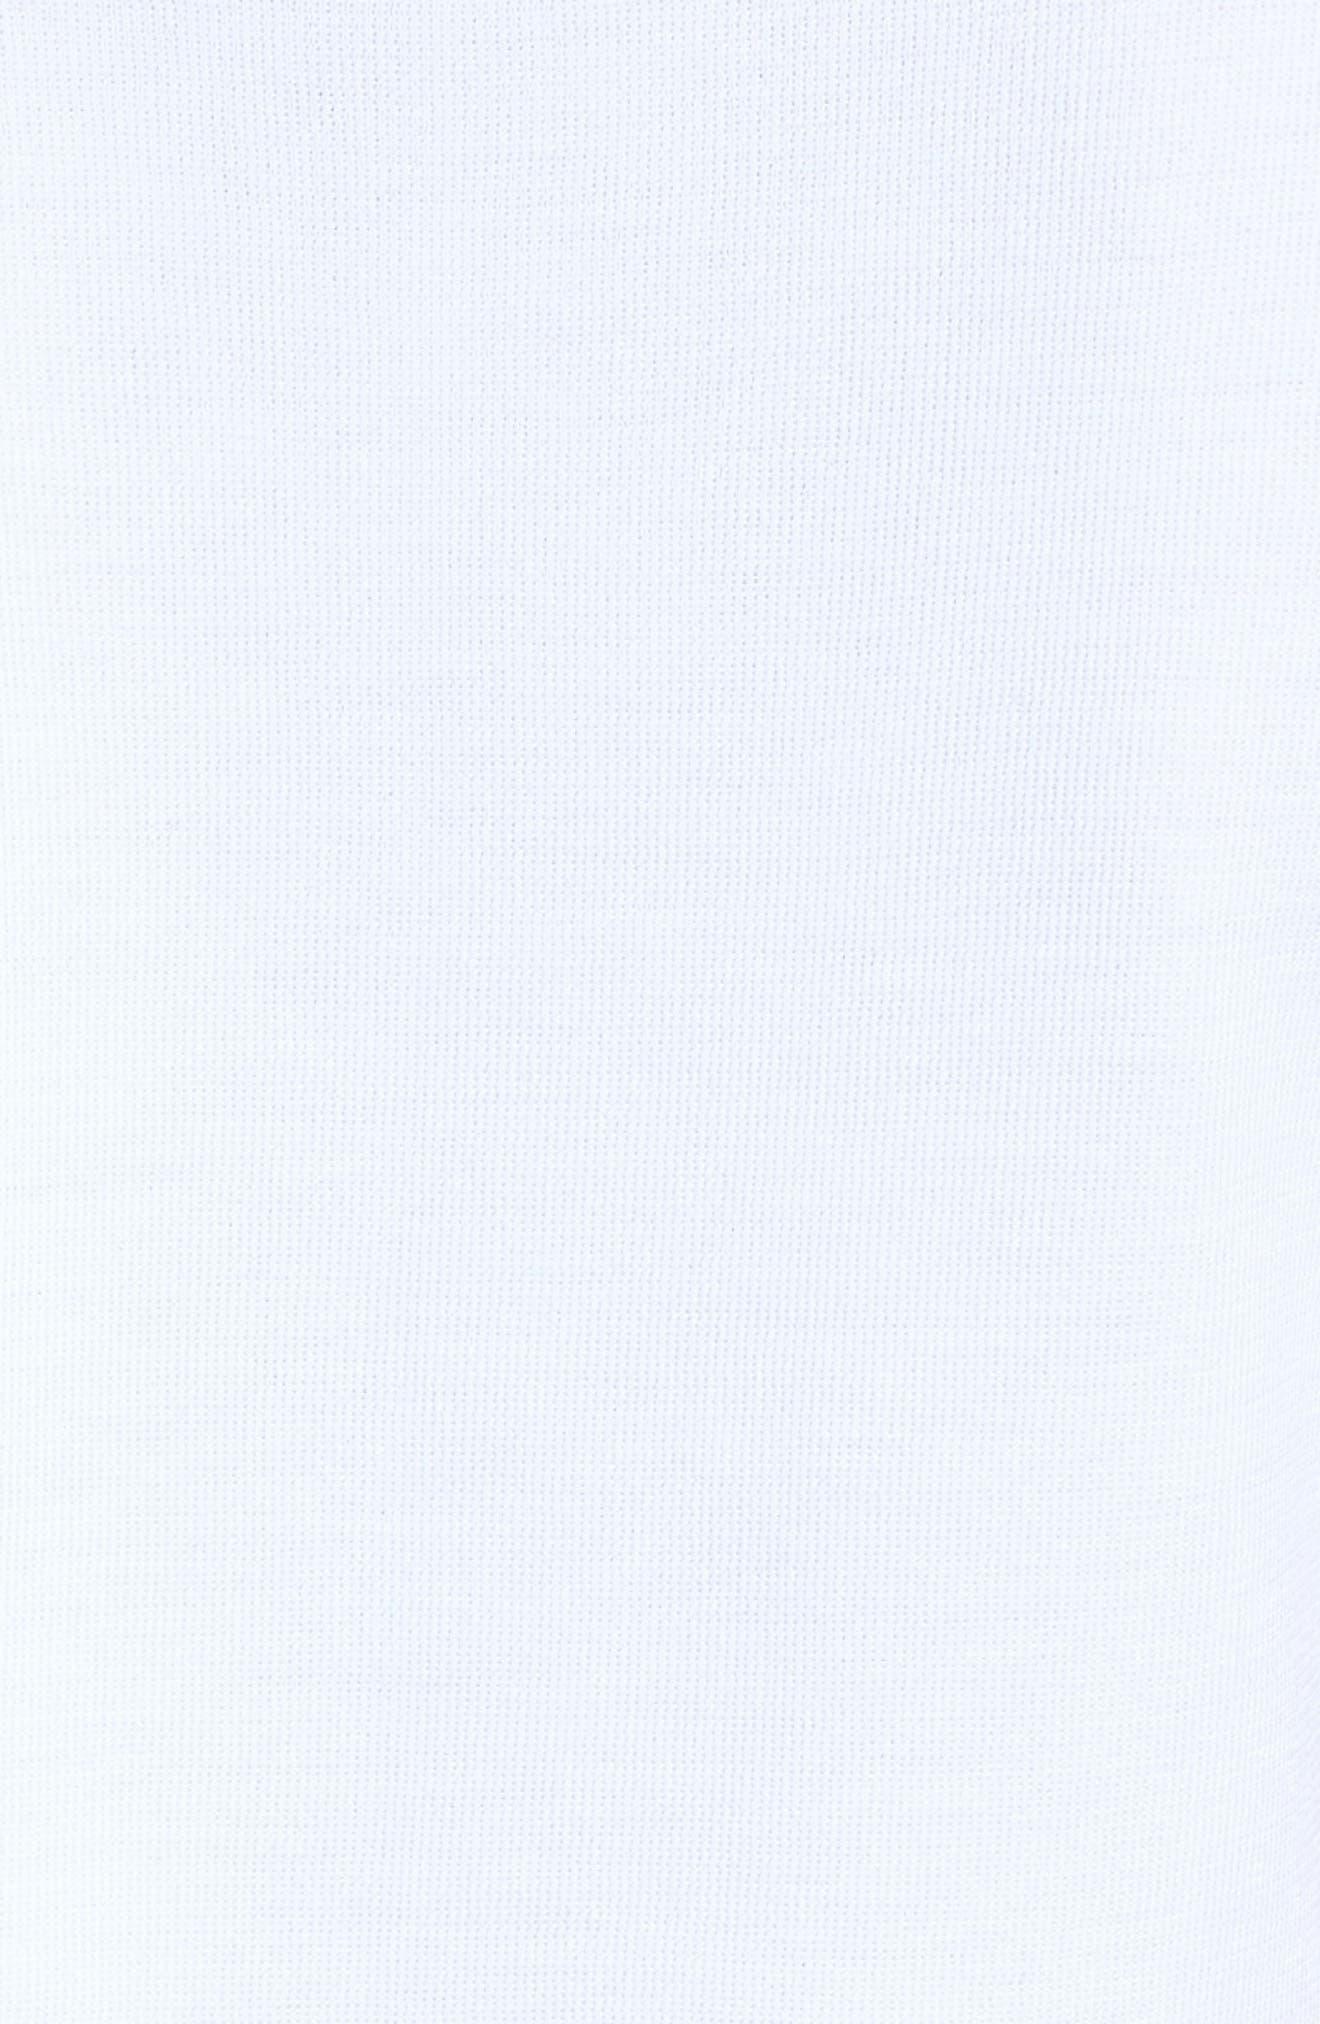 Scoop Neck Knit Tank,                             Alternate thumbnail 5, color,                             White/ Black/ Dahlia